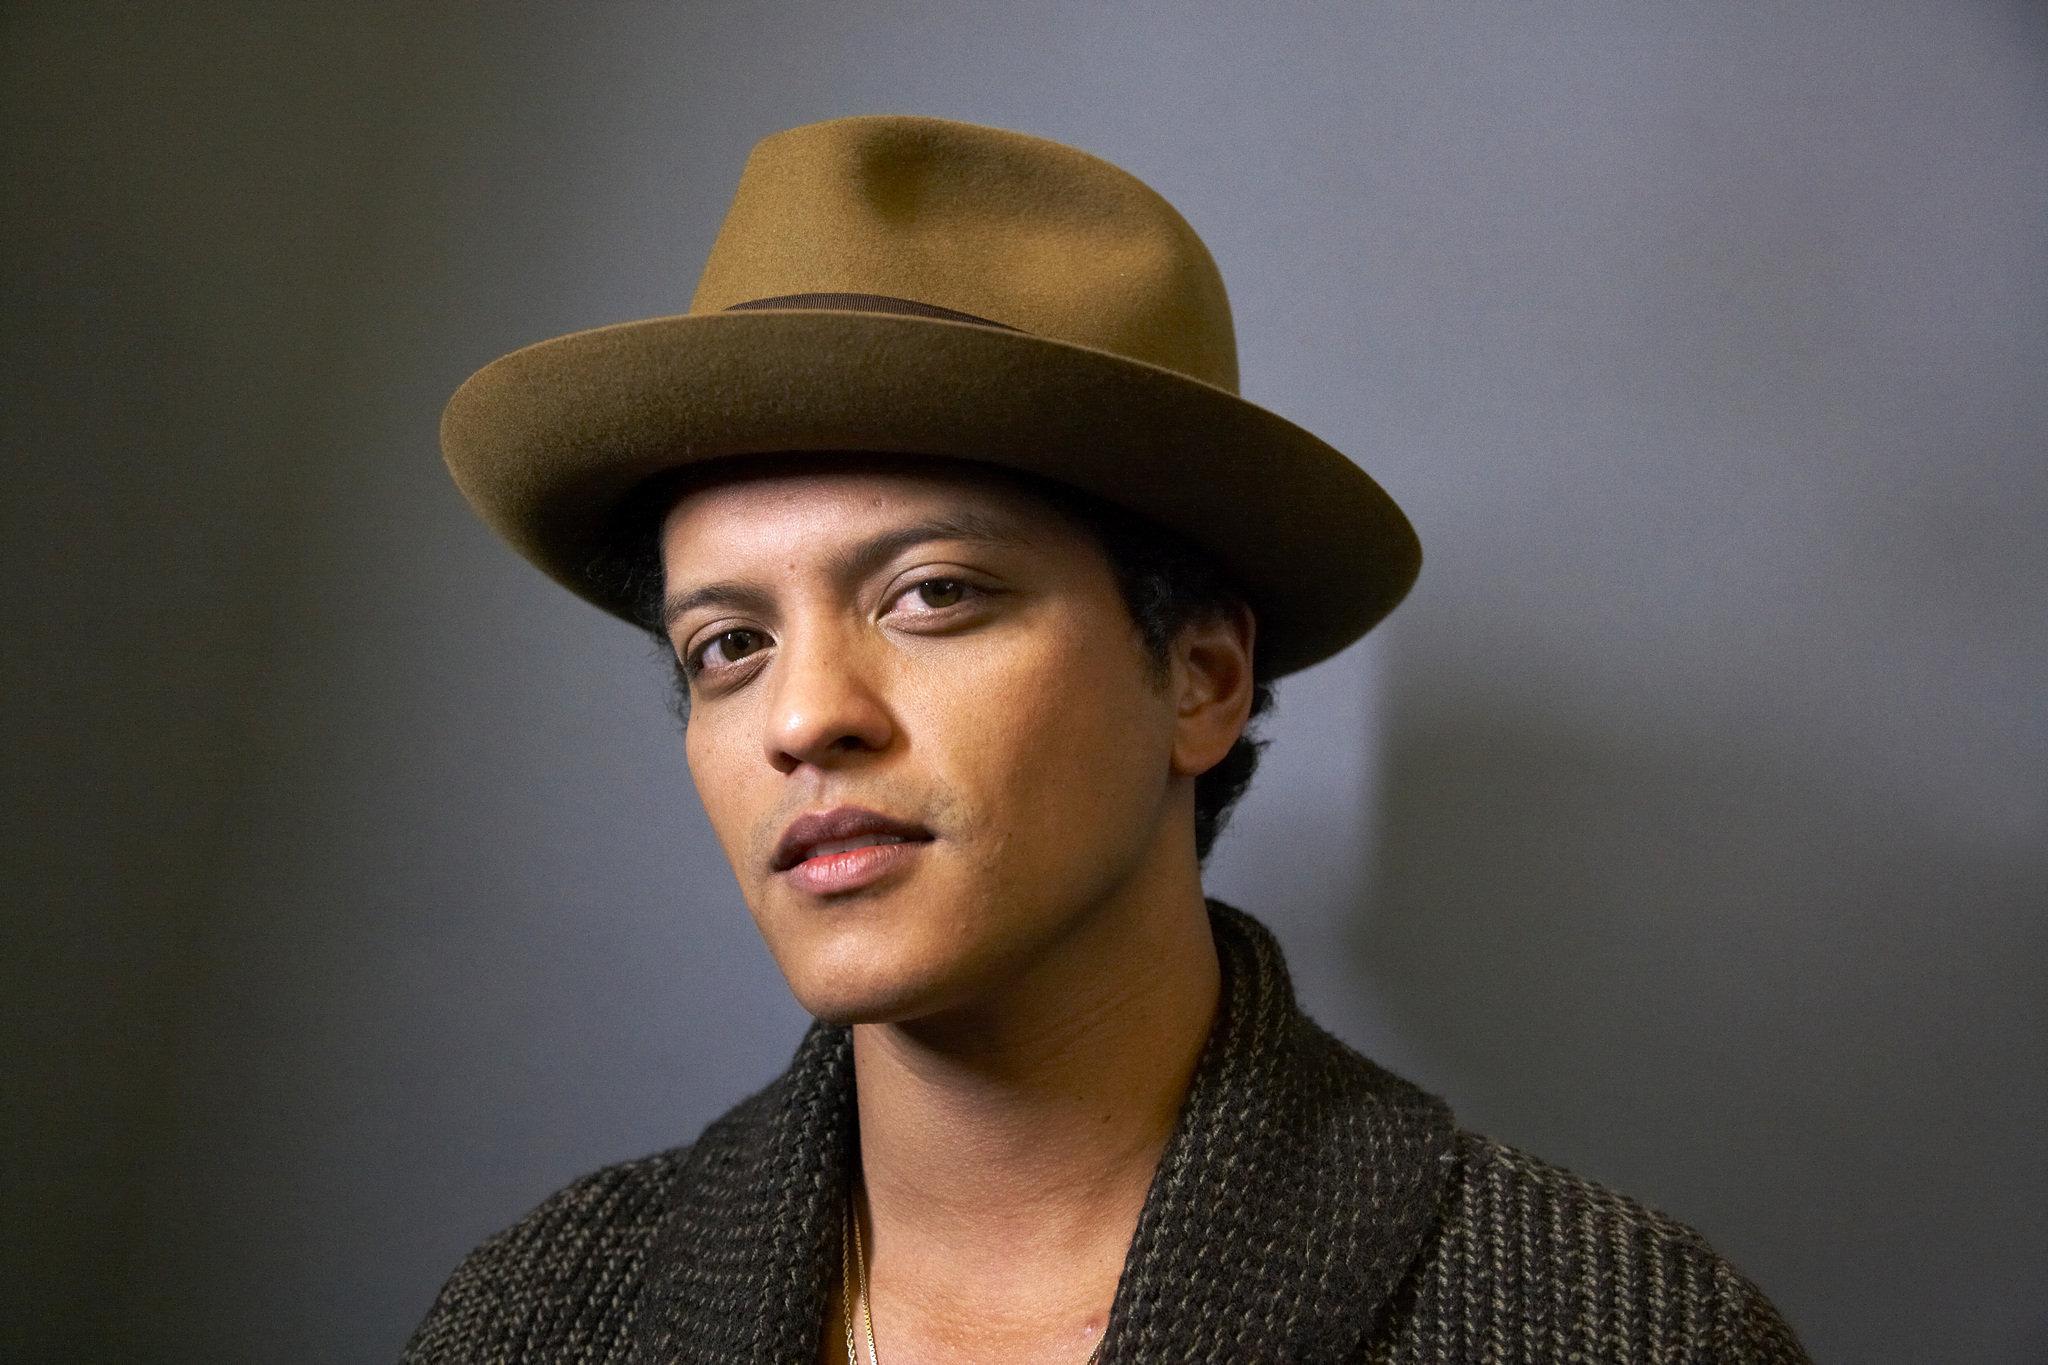 Bruno Mars Wallpapers HD Free Download